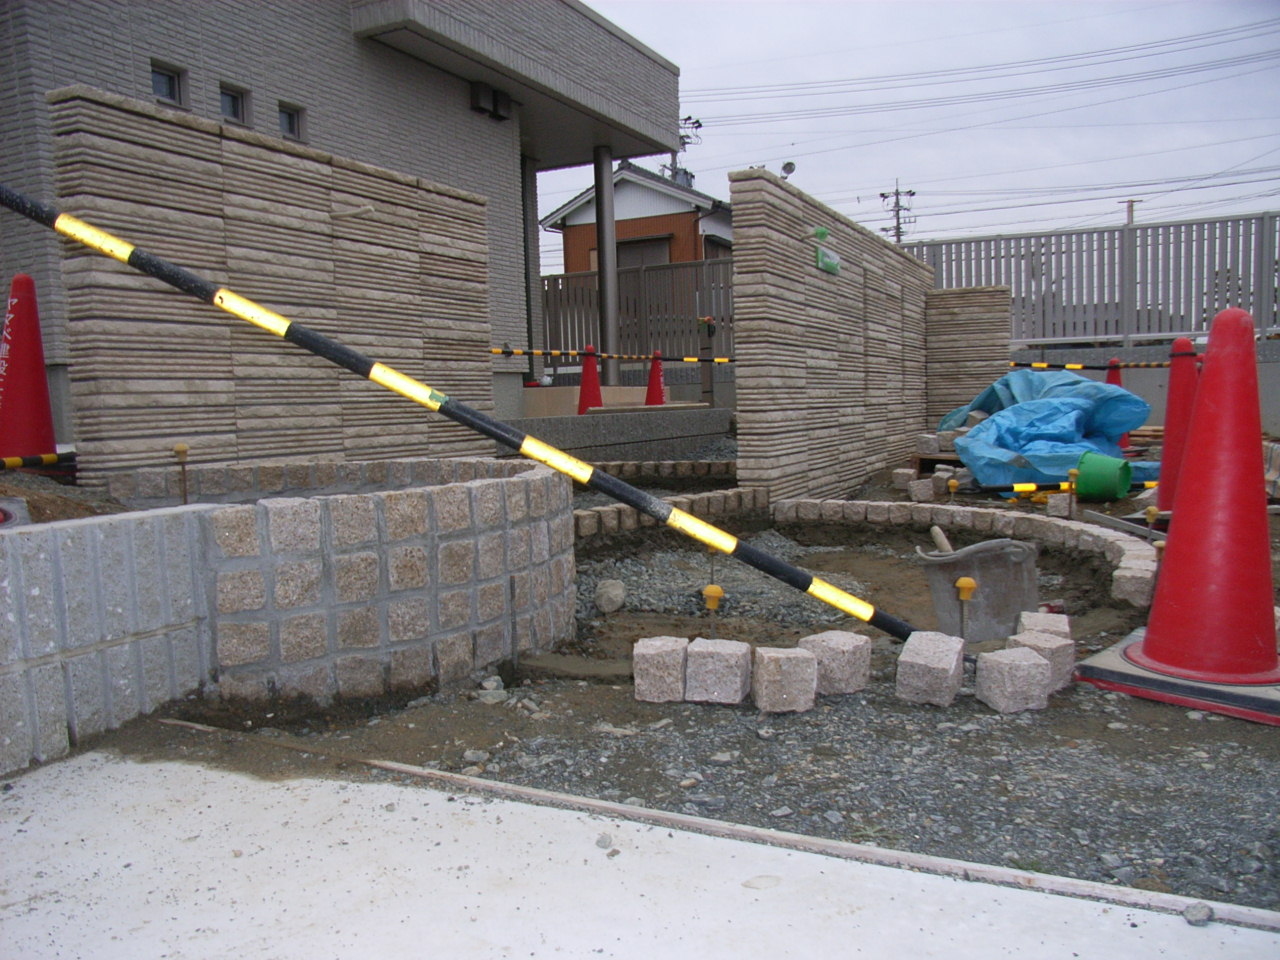 20100217 002